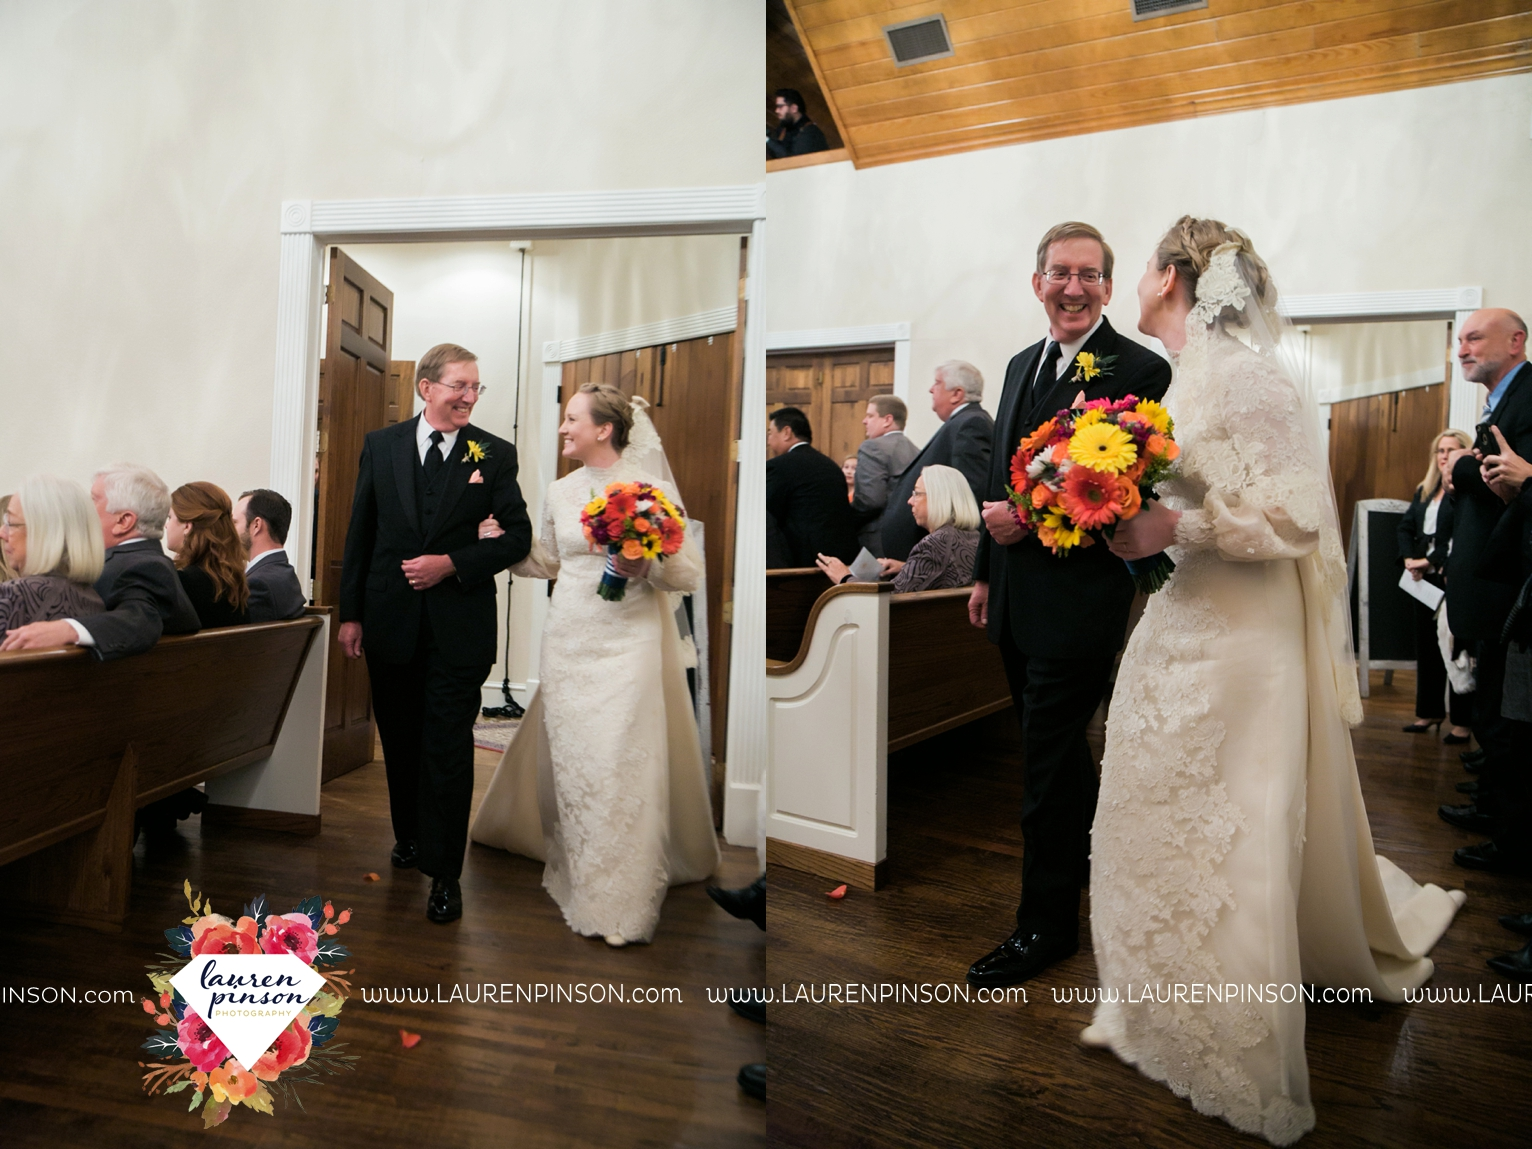 bells-texas-wedding-photography-at-willowood-ranch-chapel-north-texas-wichita-falls-wedding-photographer_1864.jpg